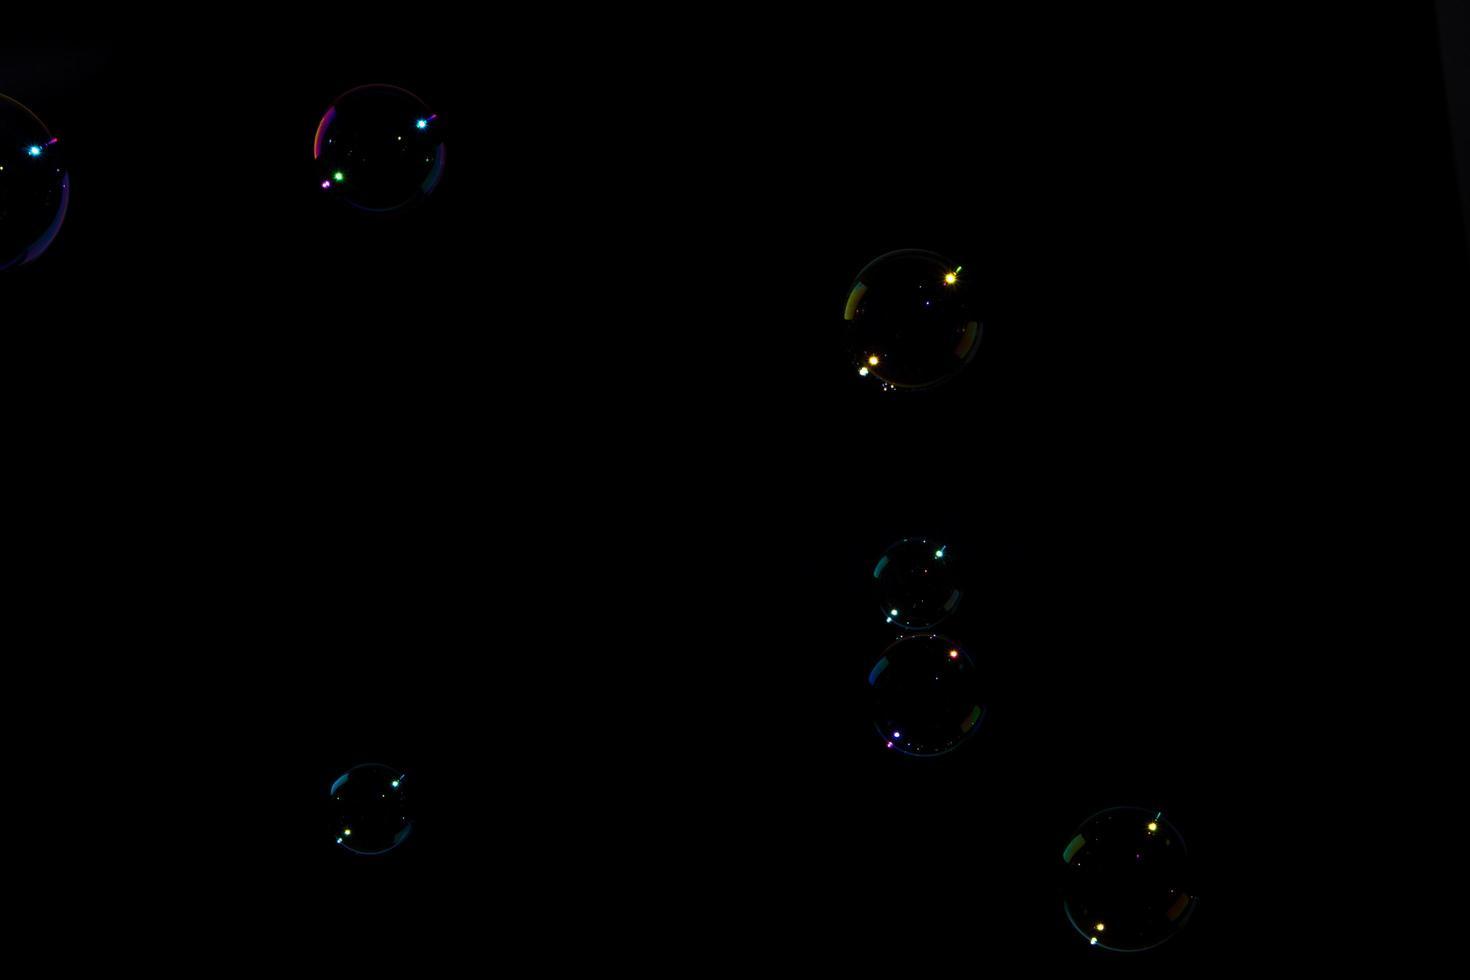 Bubbles on black background photo